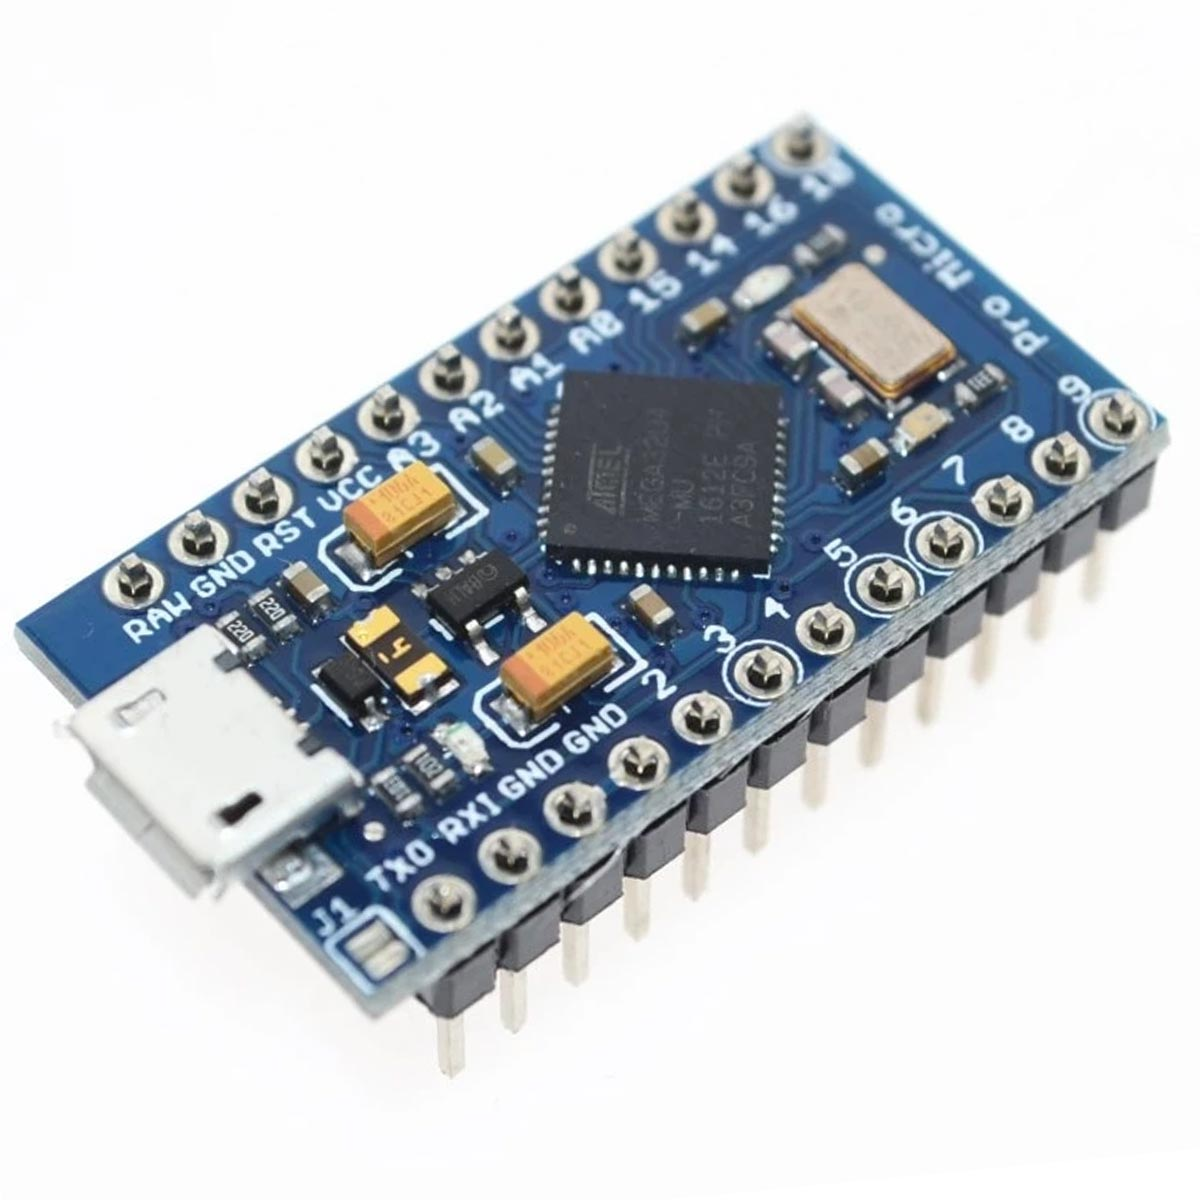 1x Placa Leonardo Pro Micro 5v + Cabo Micro USB para Arduino